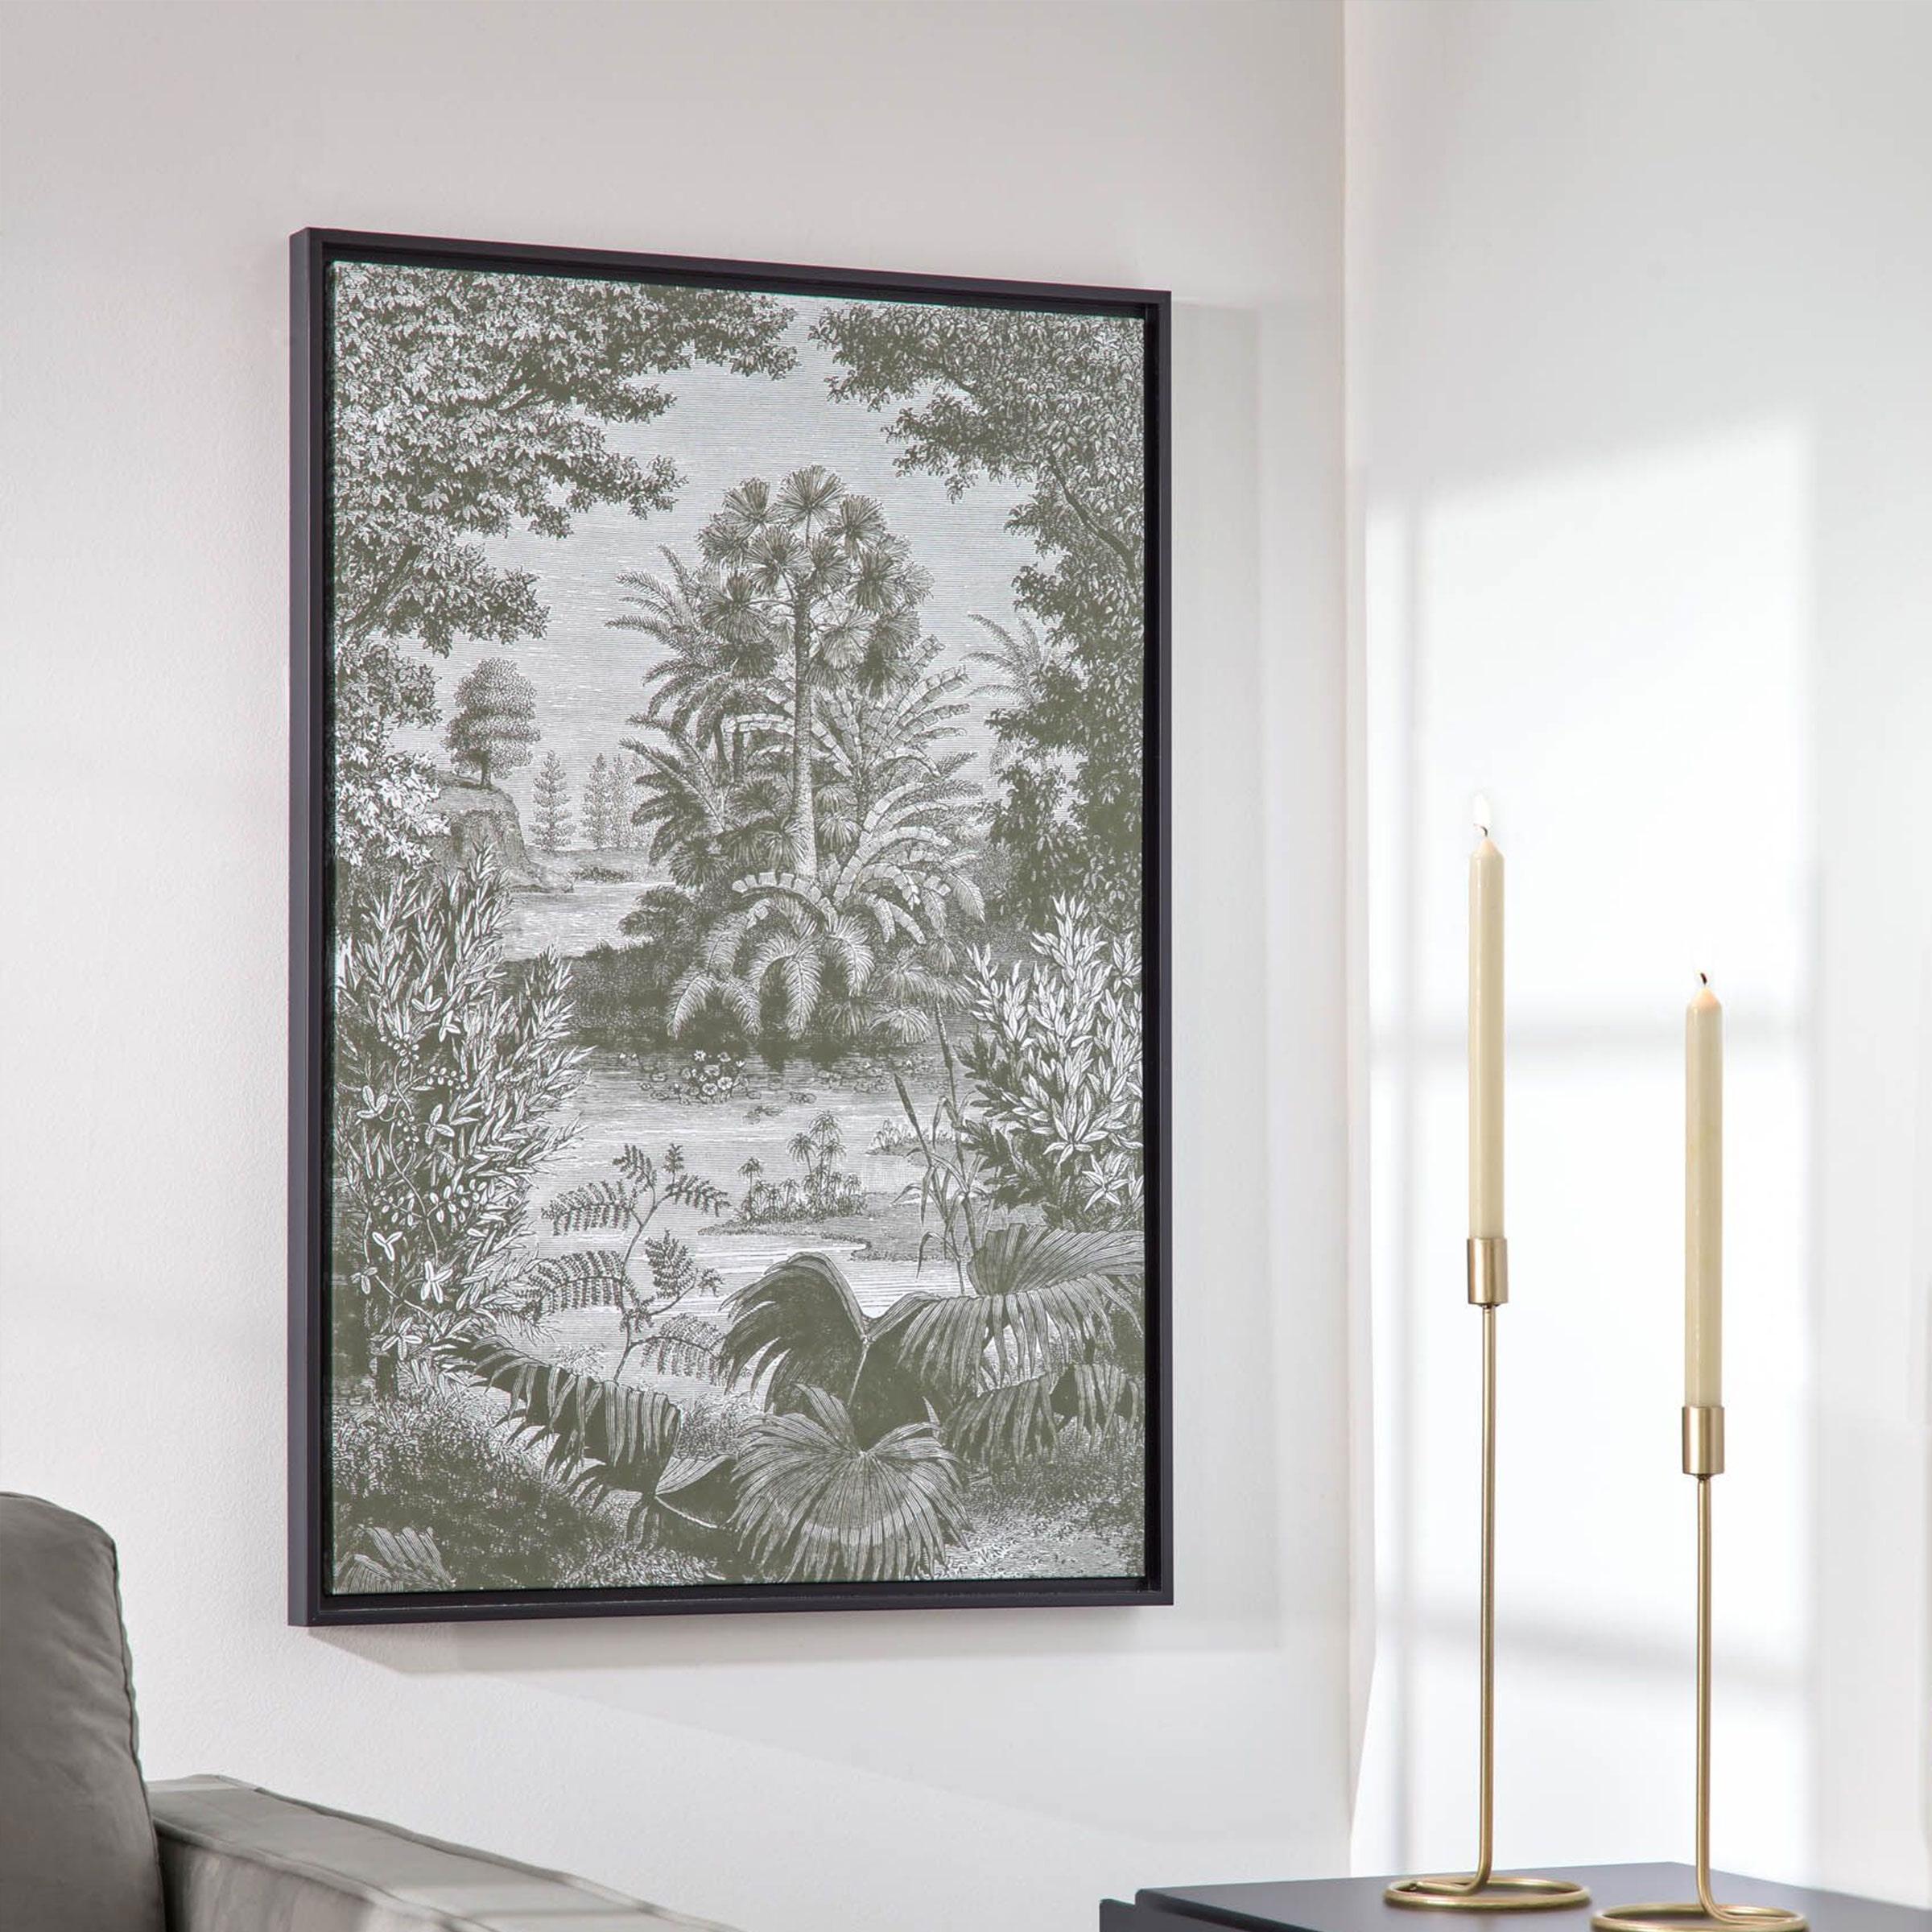 Kave Home Wanddecoratie 'Bamidele', kleur Groen